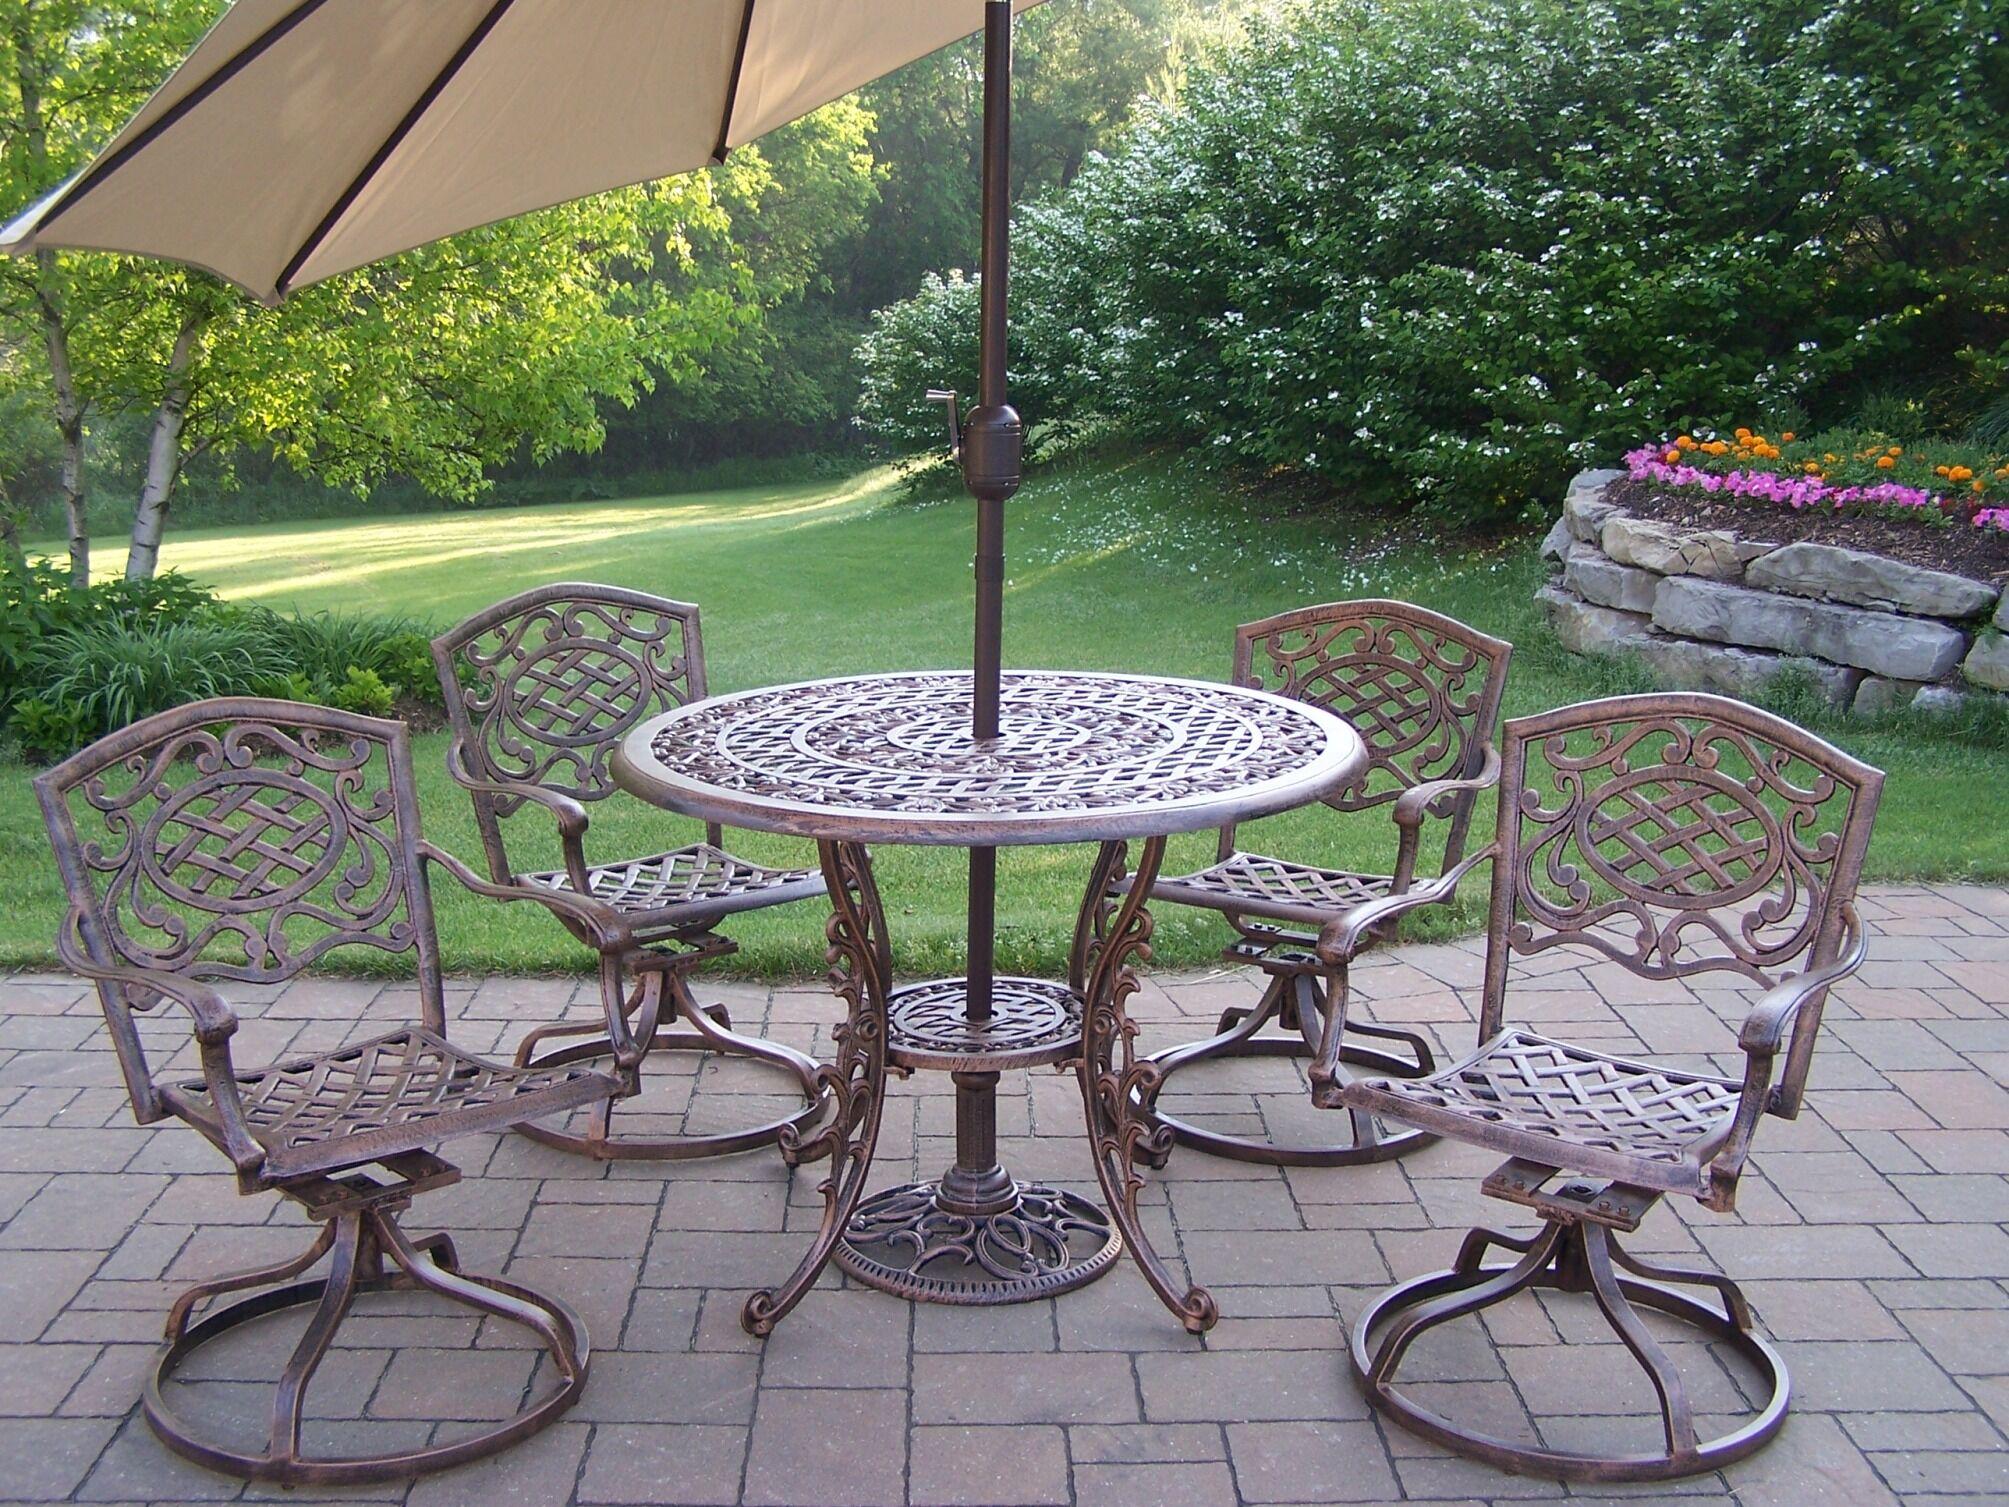 Mississippi Dining Set with Umbrella Umbrella Color: Beige